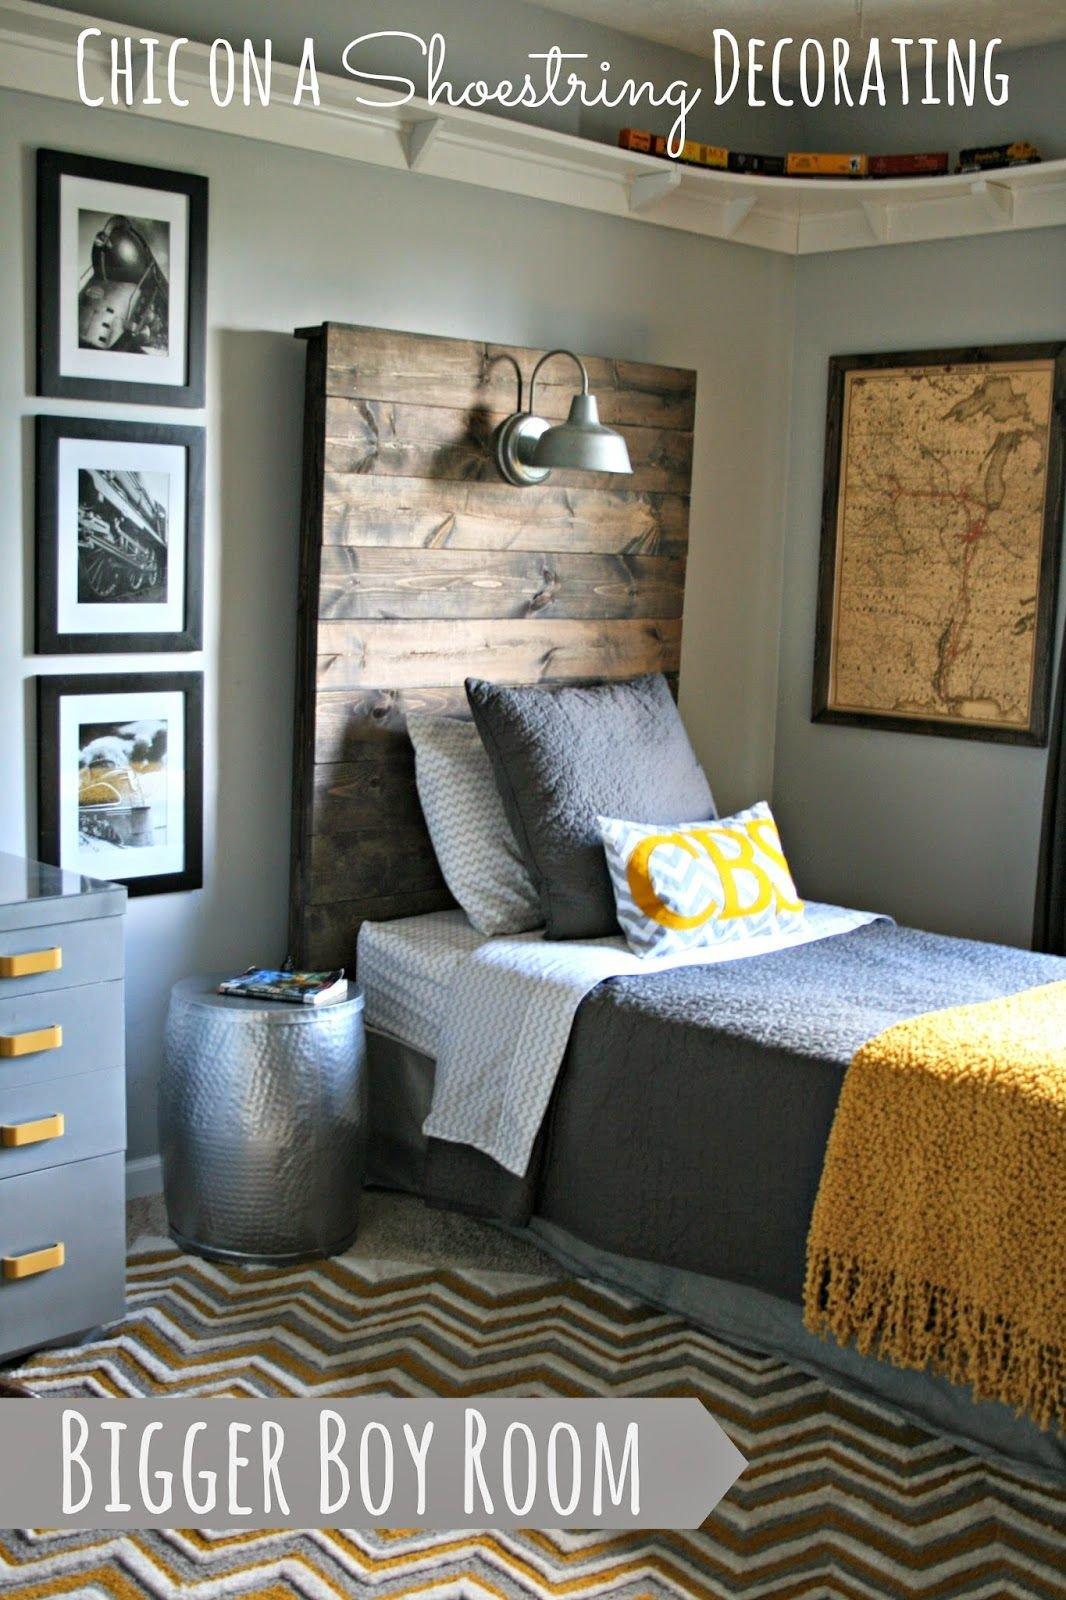 10 Year Old Boy Bedroom Ideas New 73 Best Big Boy Room Ideas Images